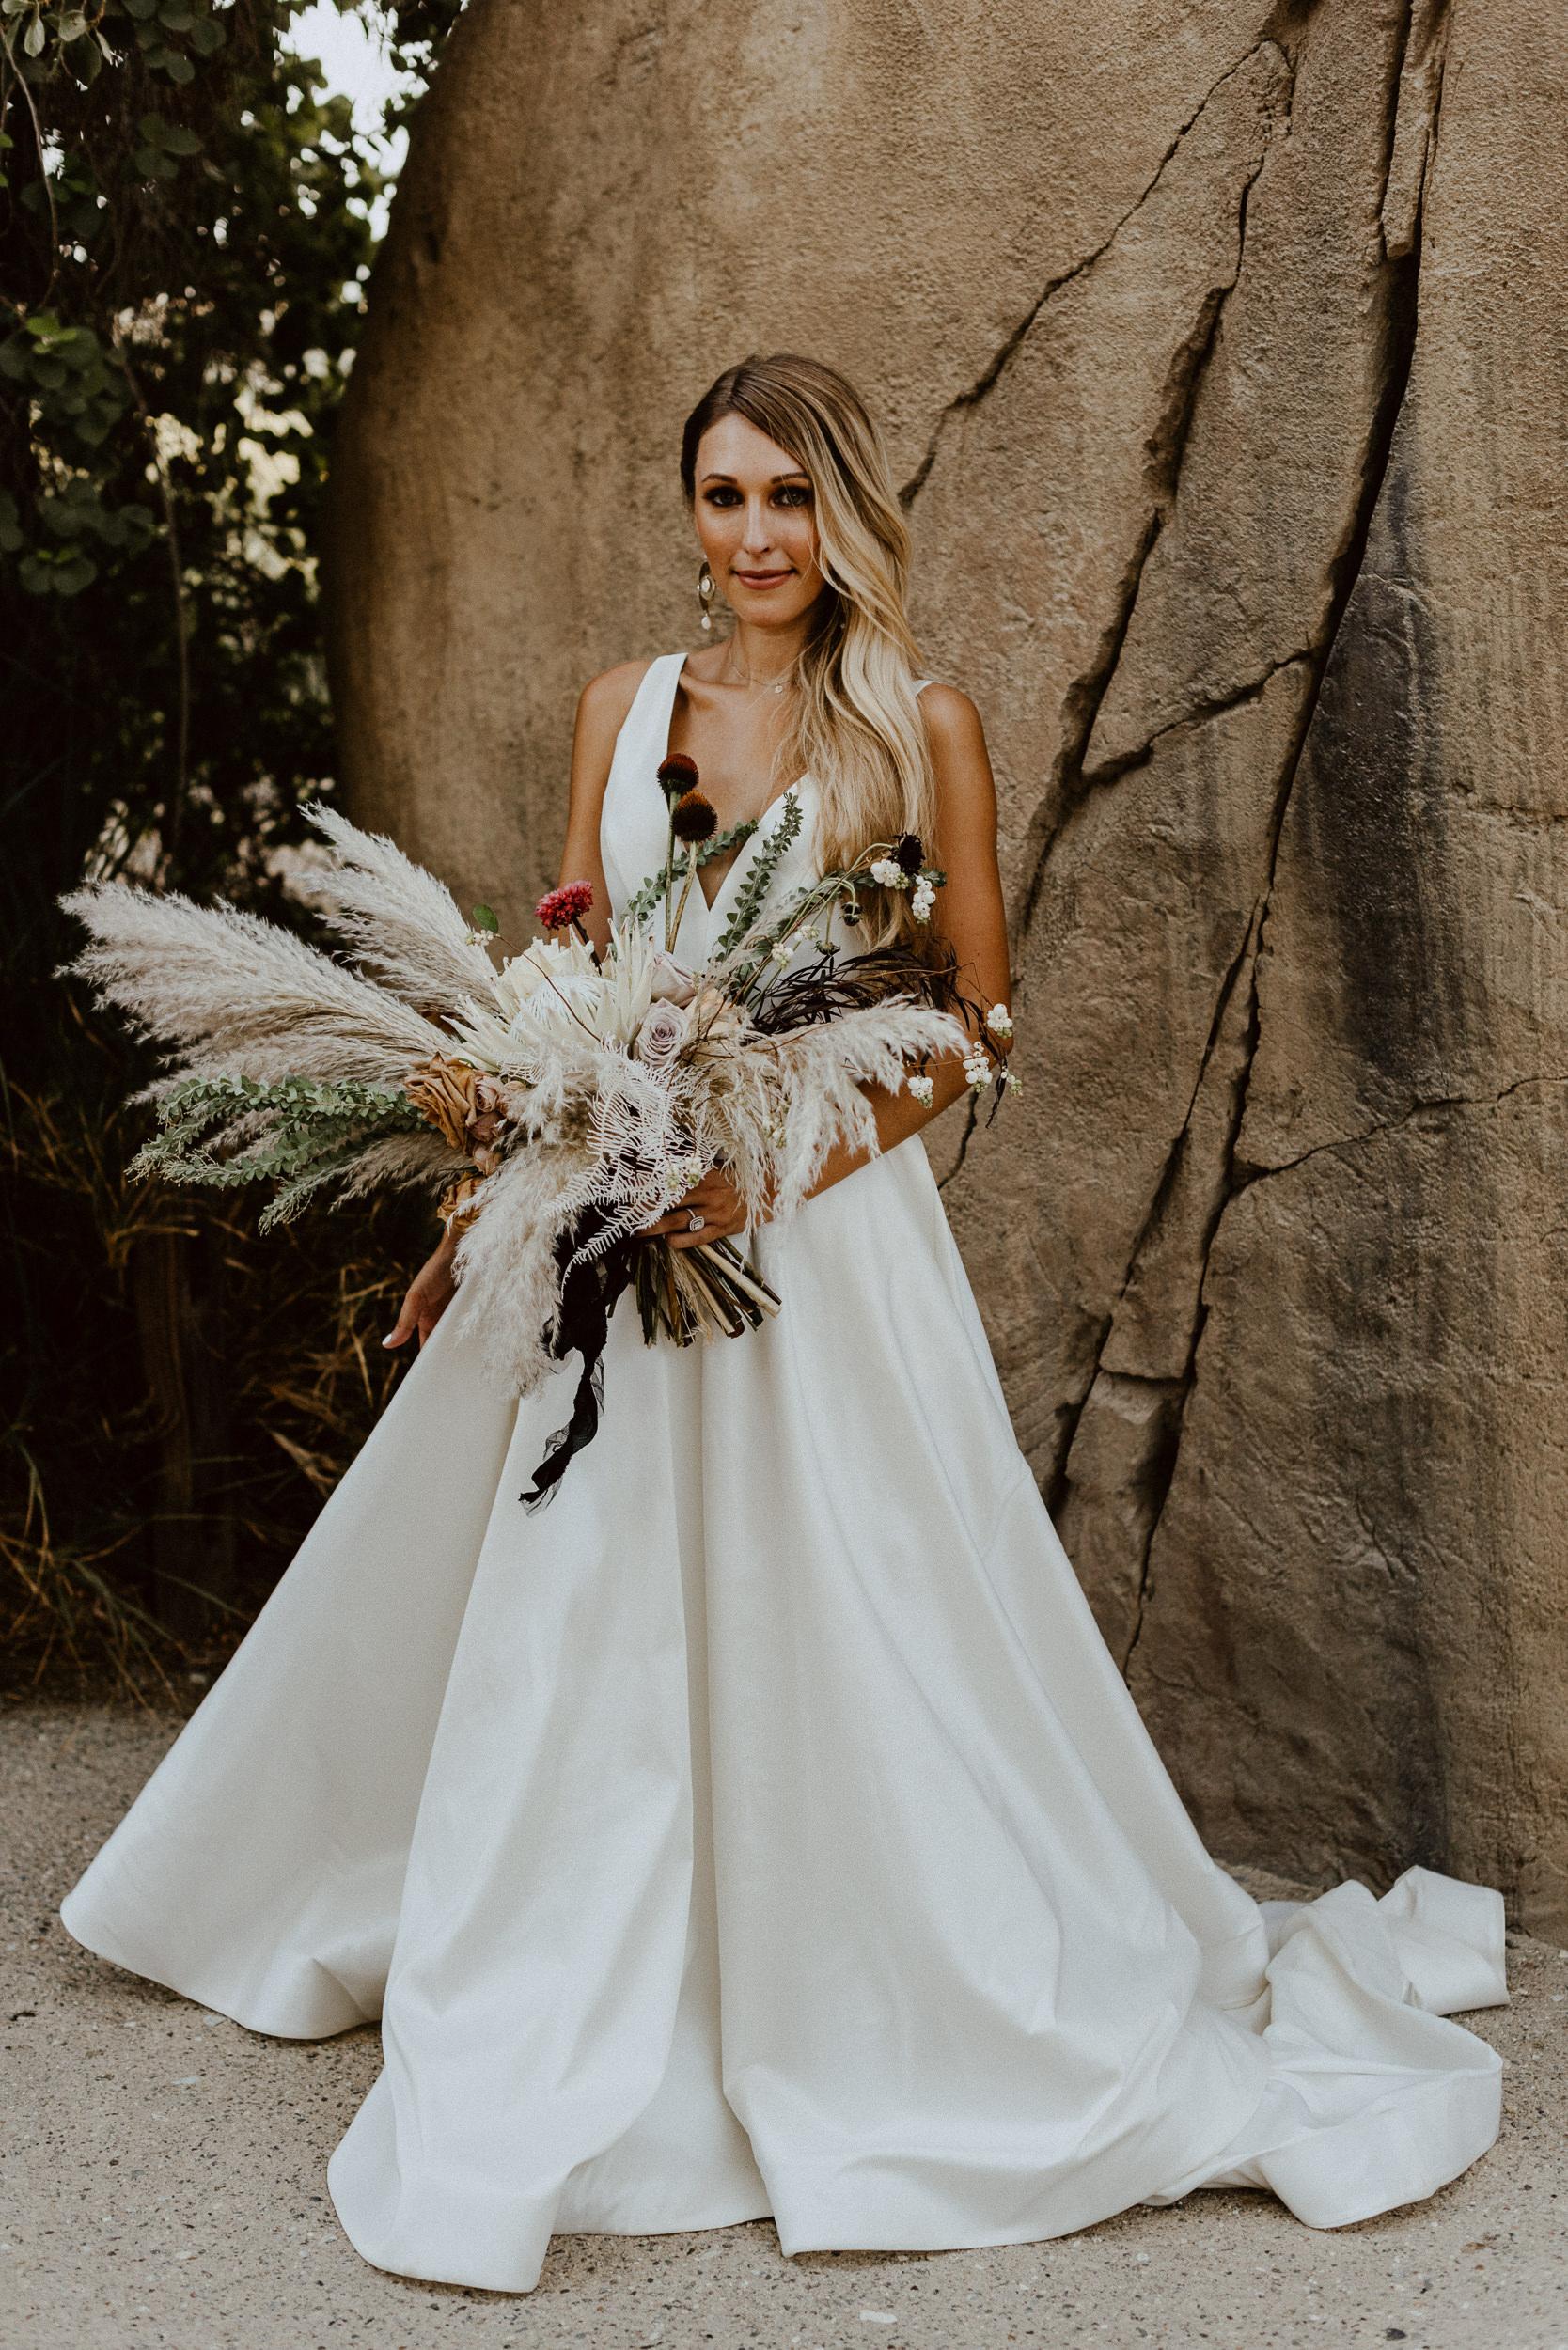 sChelsie + Chris - The Desert Shootout Wedding Romantics at The Living Desert-108.jpg